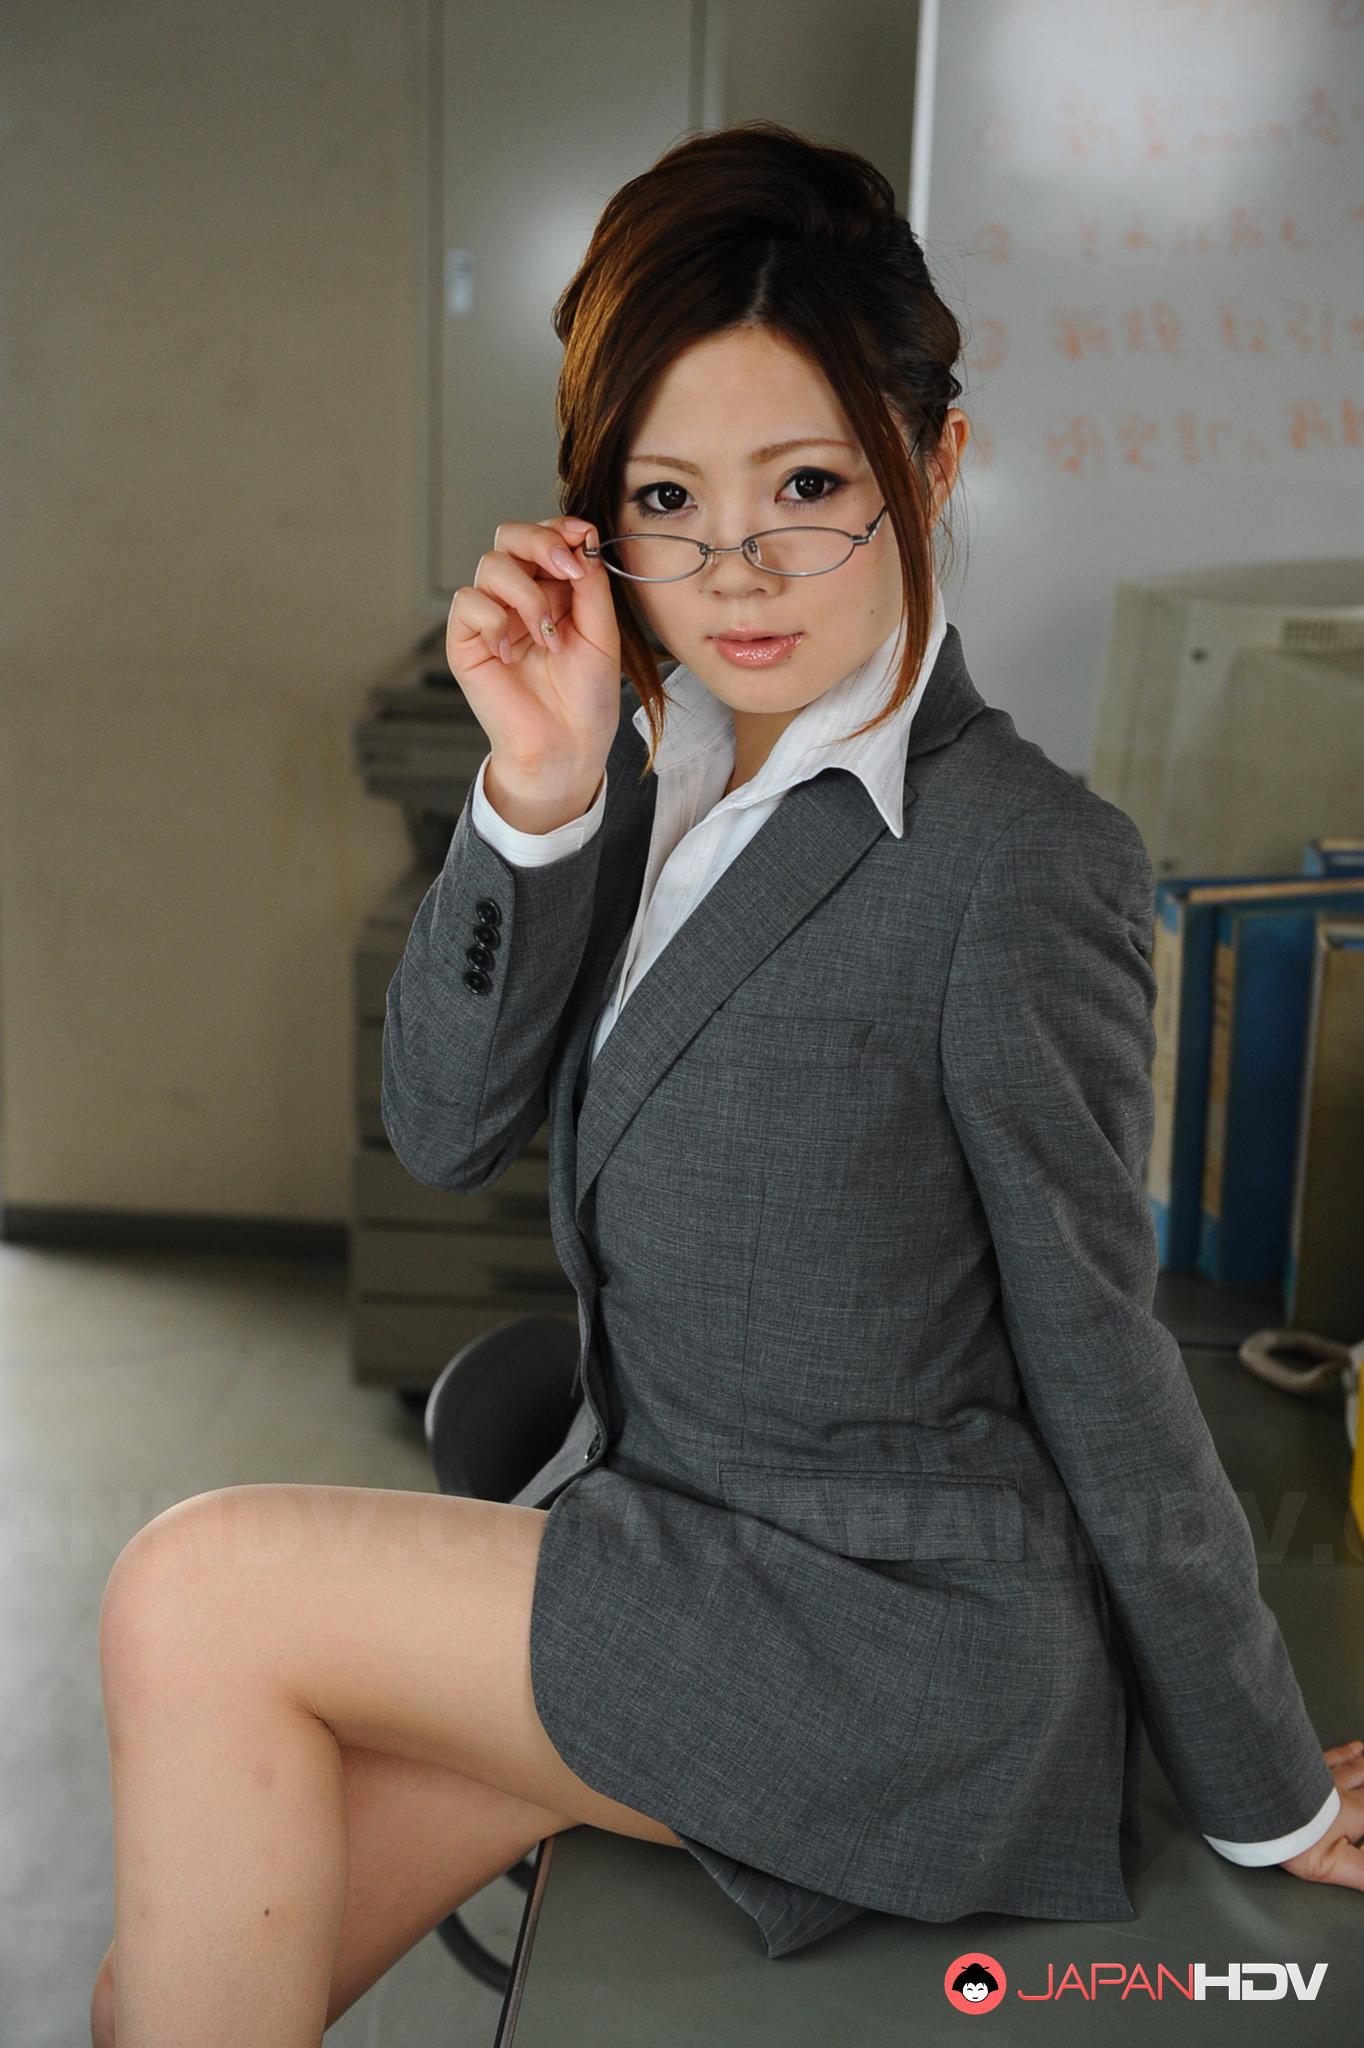 Shy Business Beauty Posing